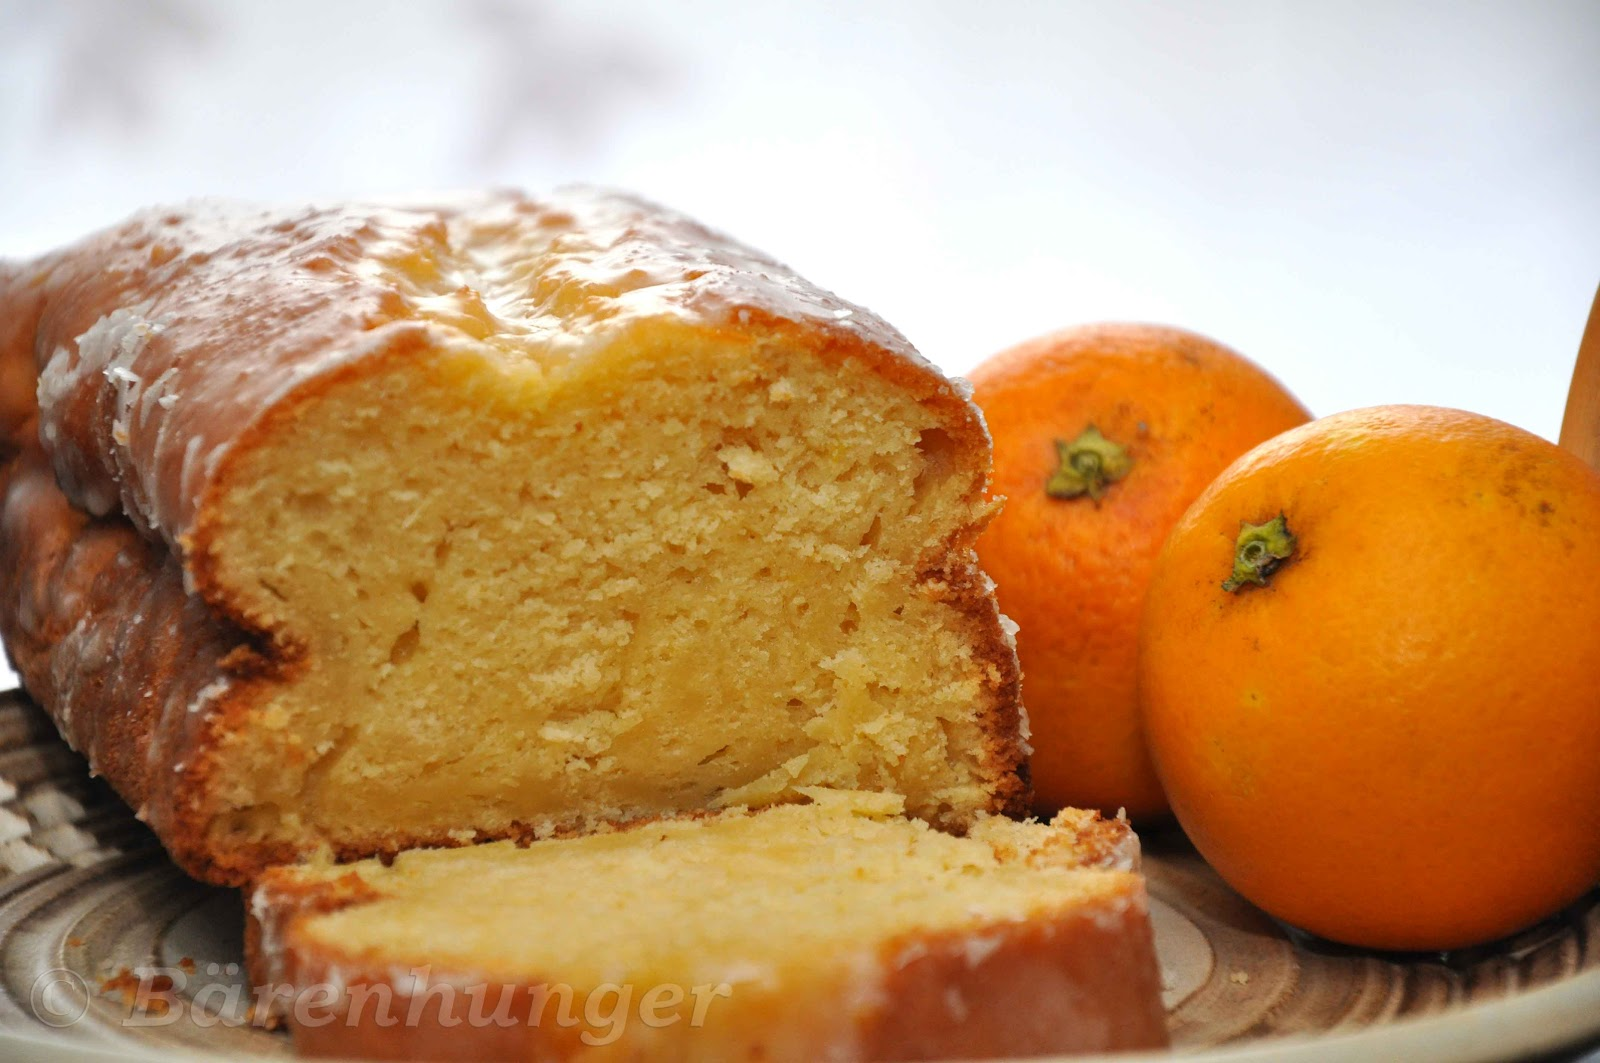 Orangen Joghurt Kuchen Barenhunger